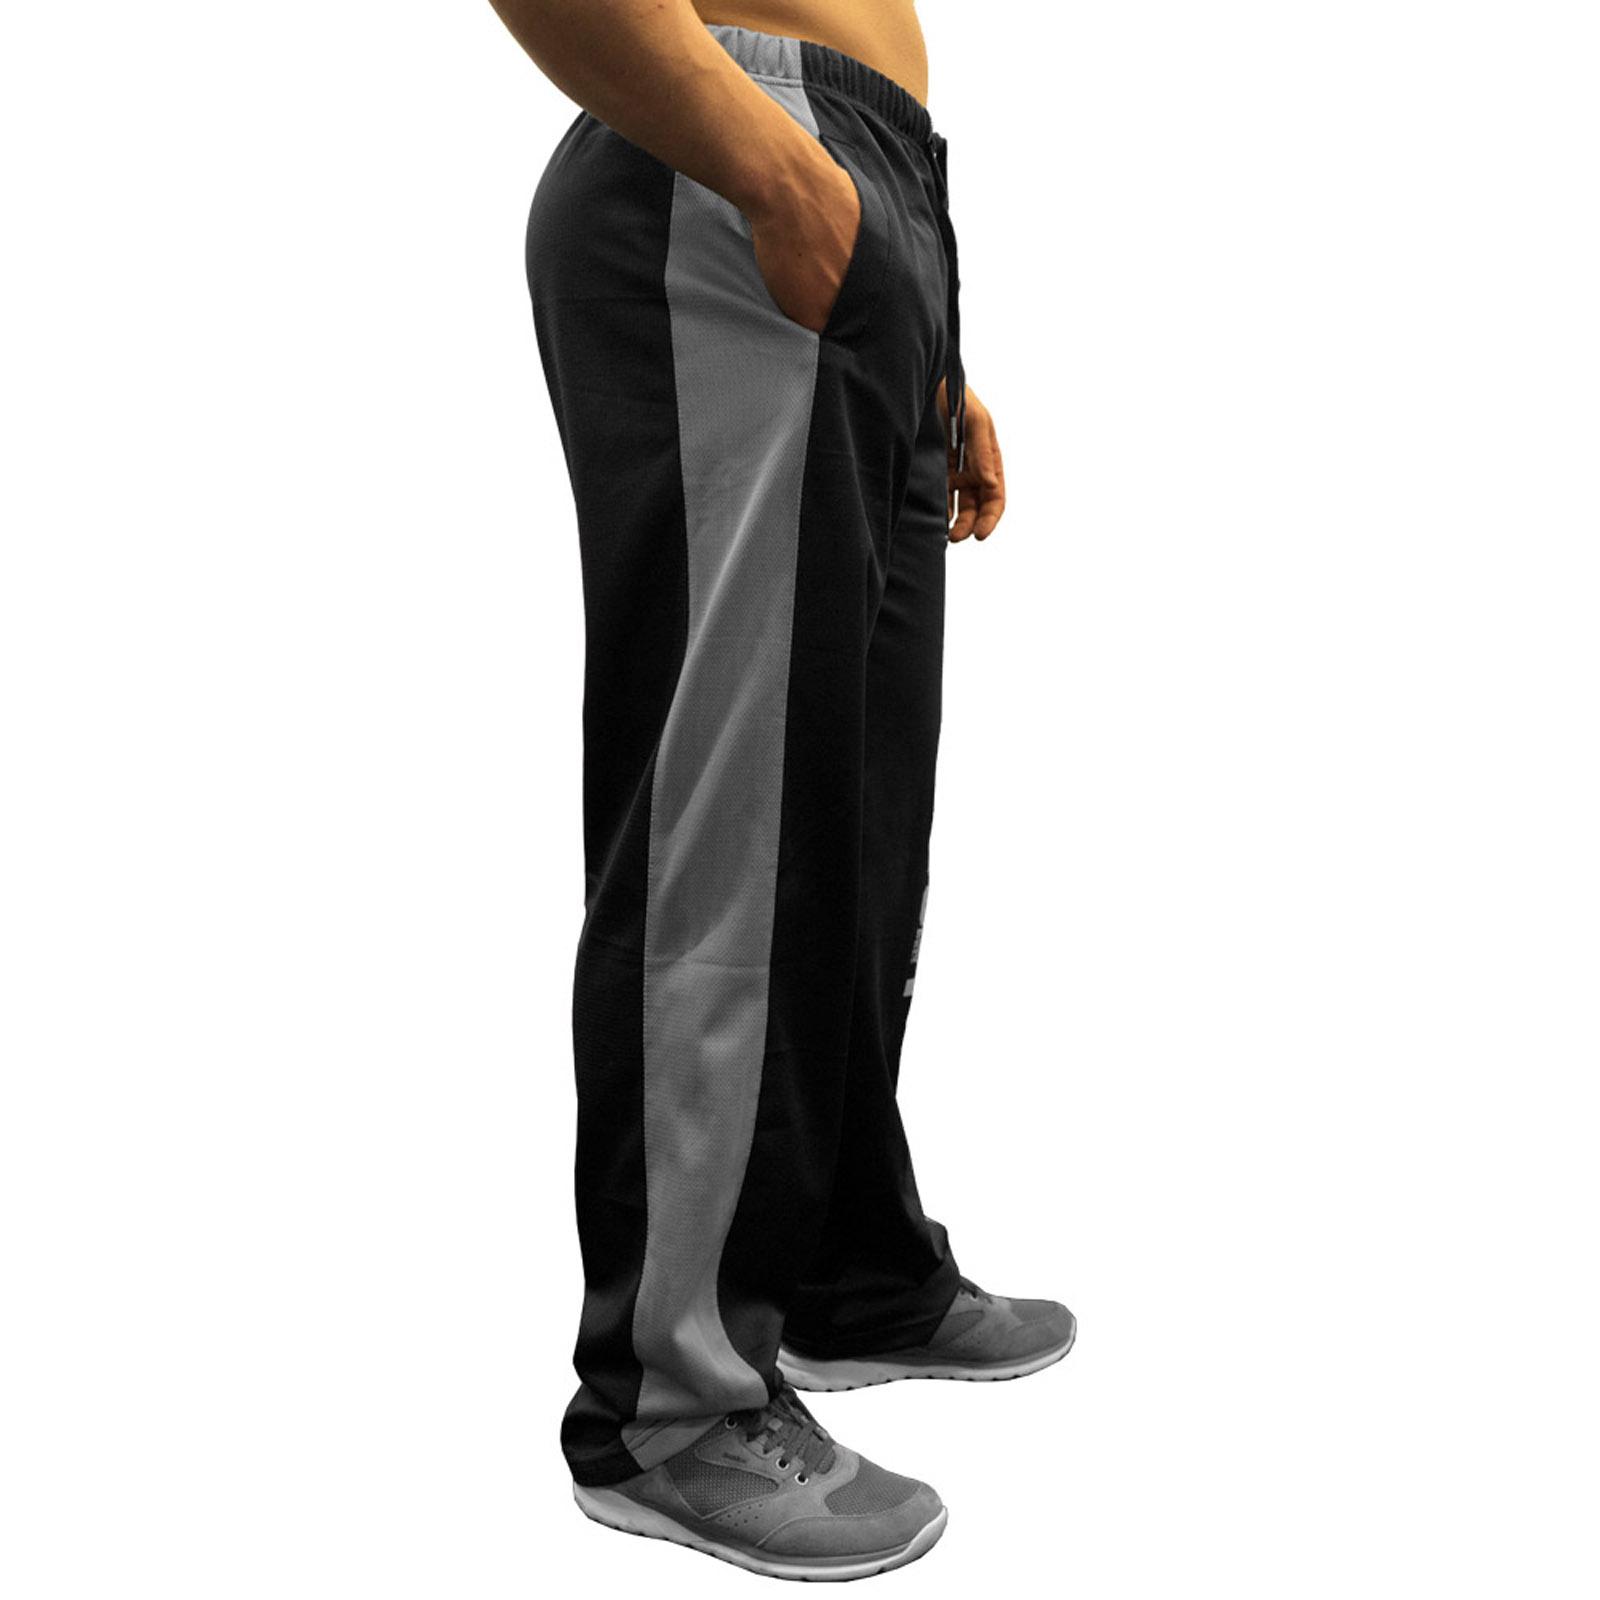 LP Limits Legal Power MESH PANTS Black//Grey  Art.6411-760 climaticmesh Polyester